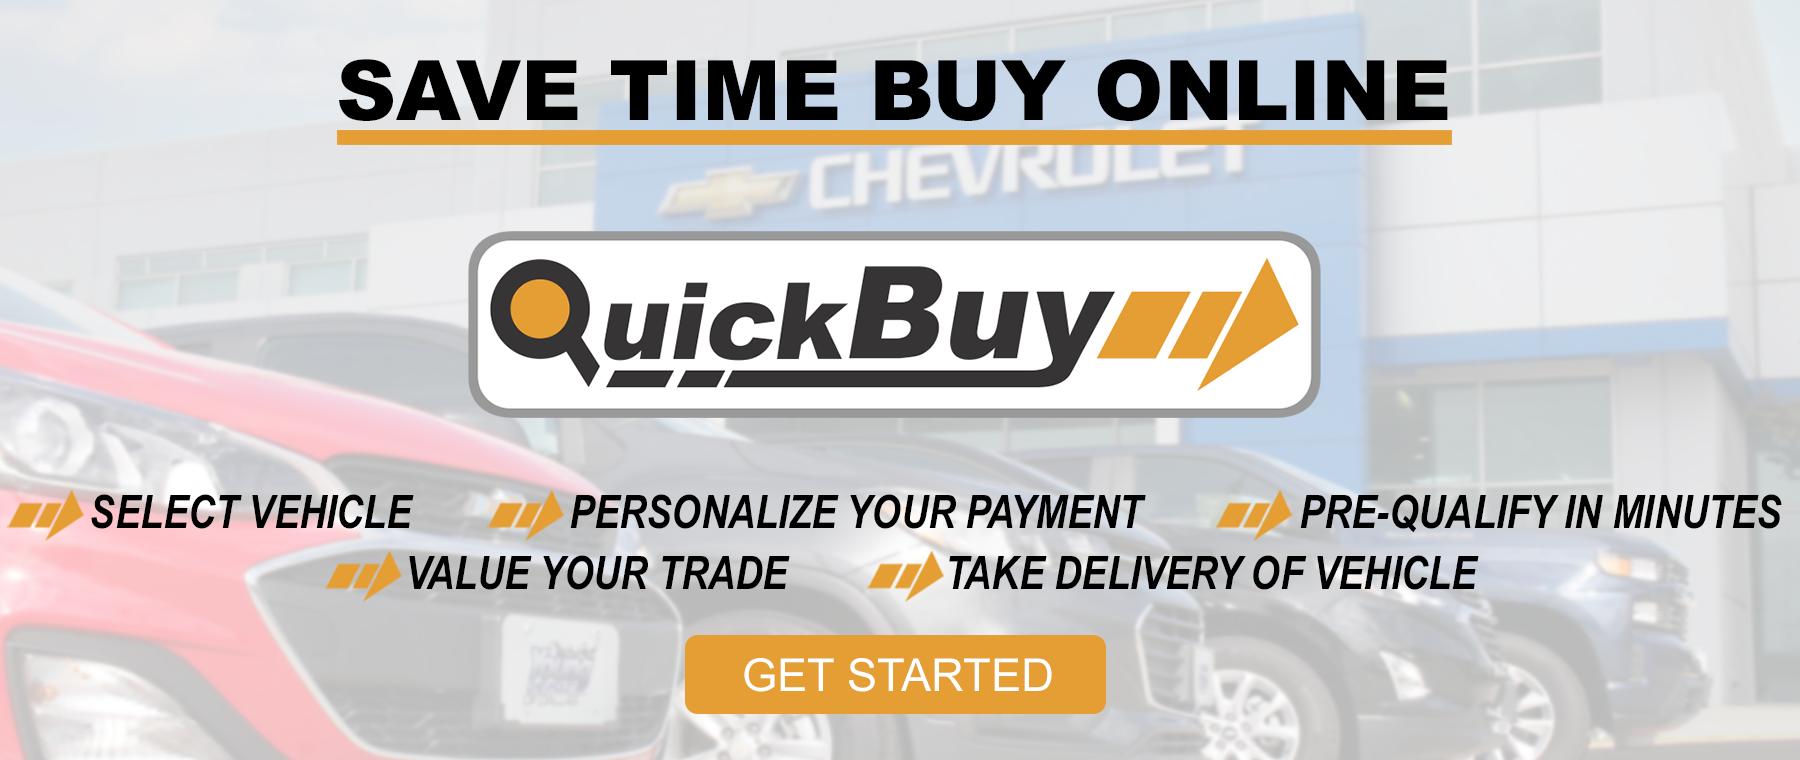 quickbuy banner